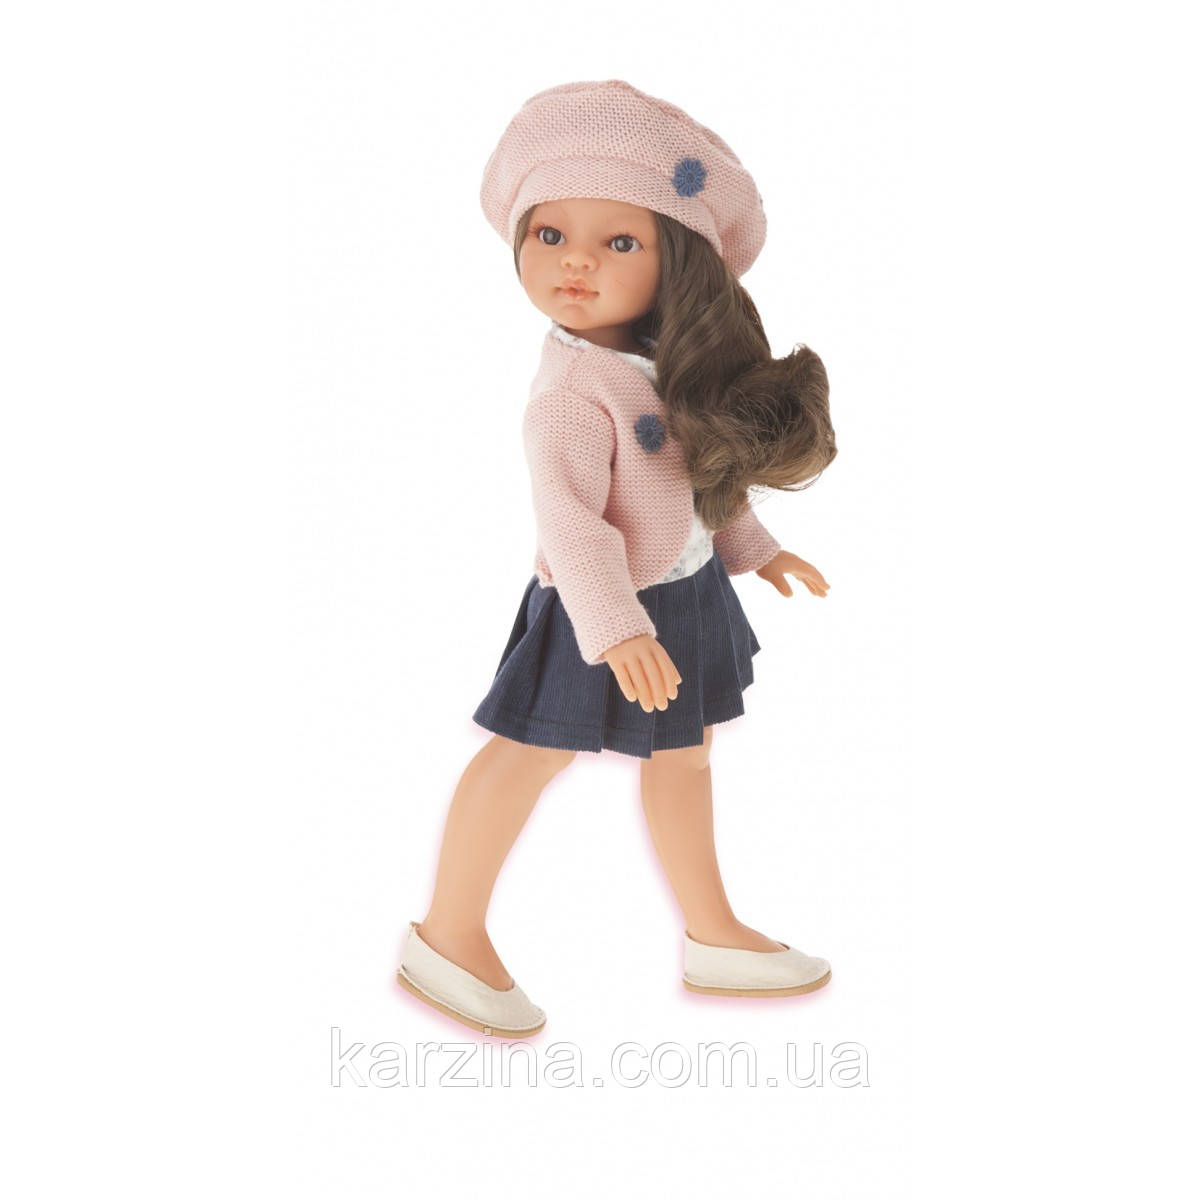 Кукла Эмили 33см. от Antonio Juan